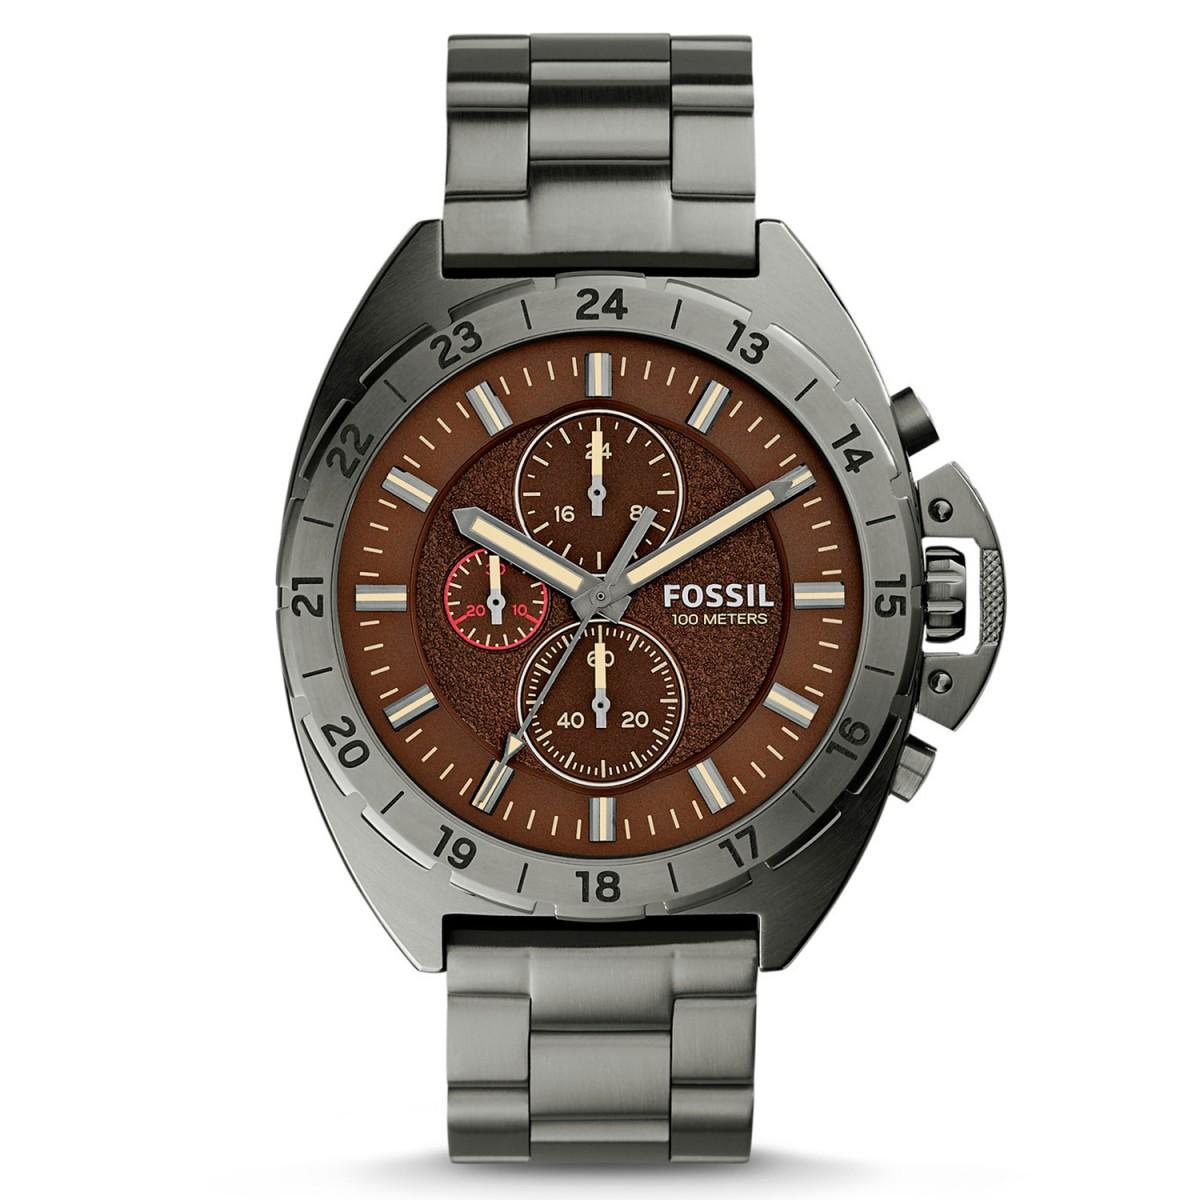 b423305299479 Compre Relógio Fossil Breaker em 10X   Tri-Jóia Shop